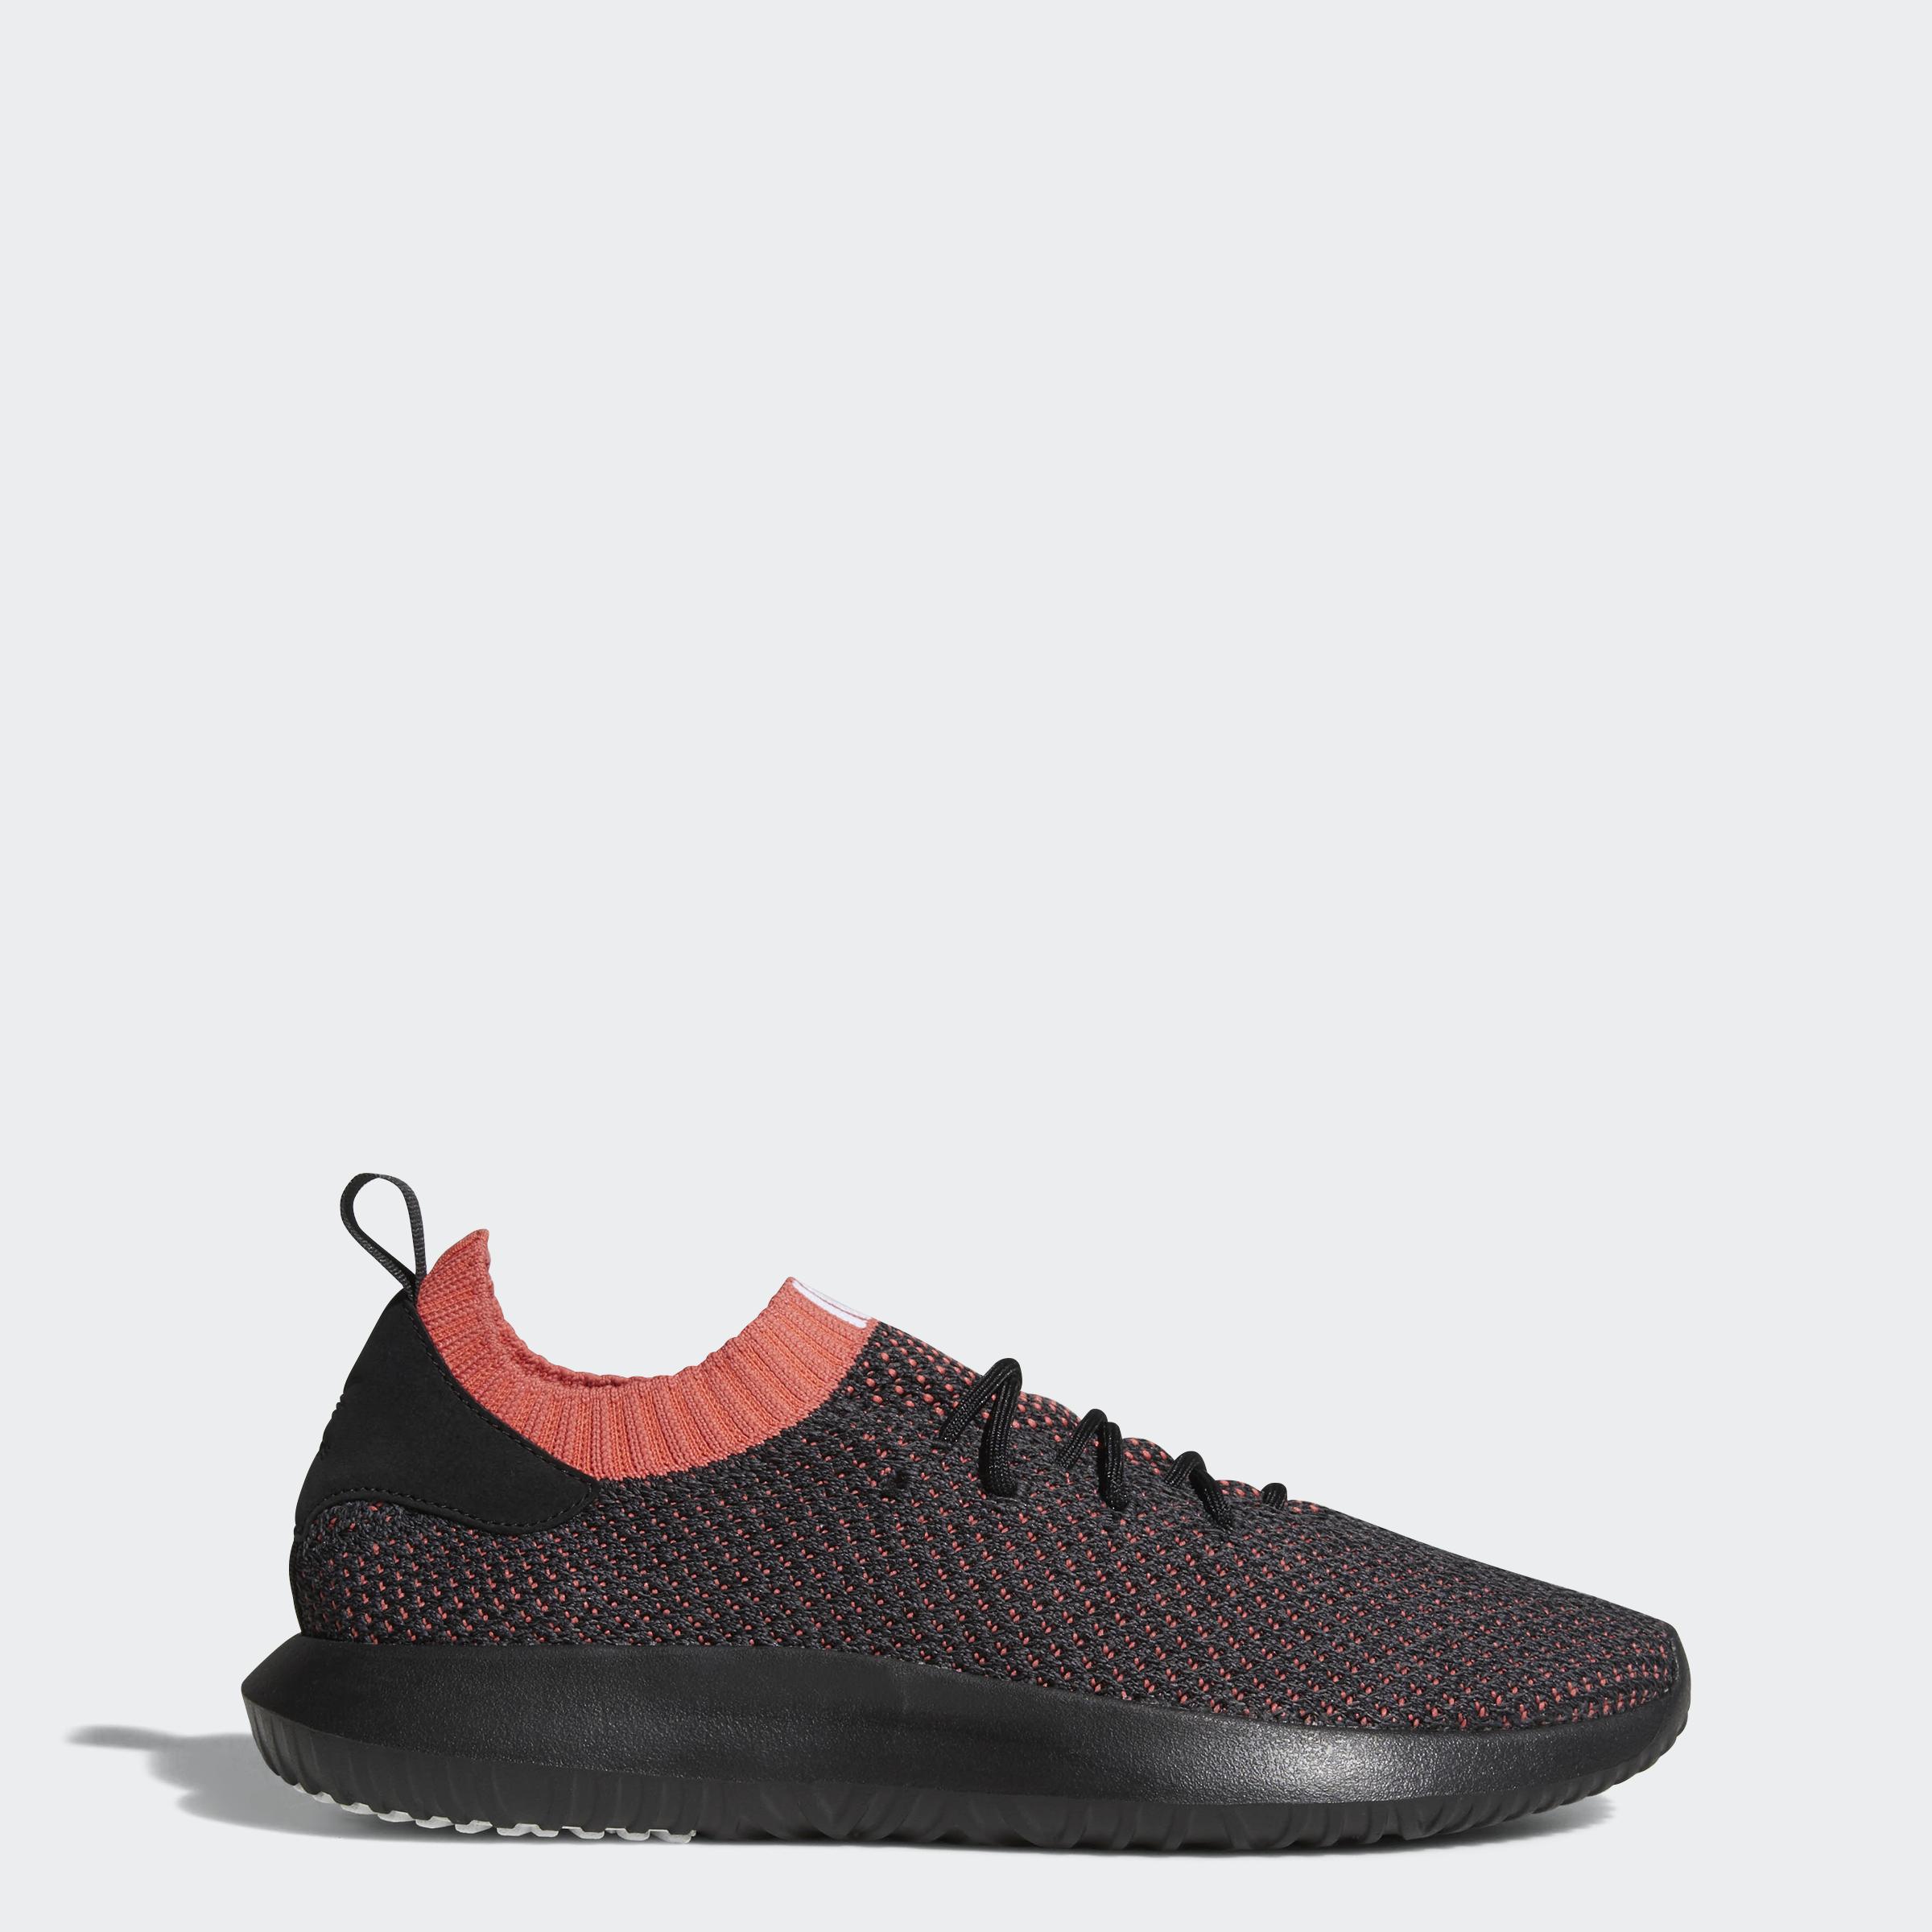 Adidas Tubular Shadow Primeknit